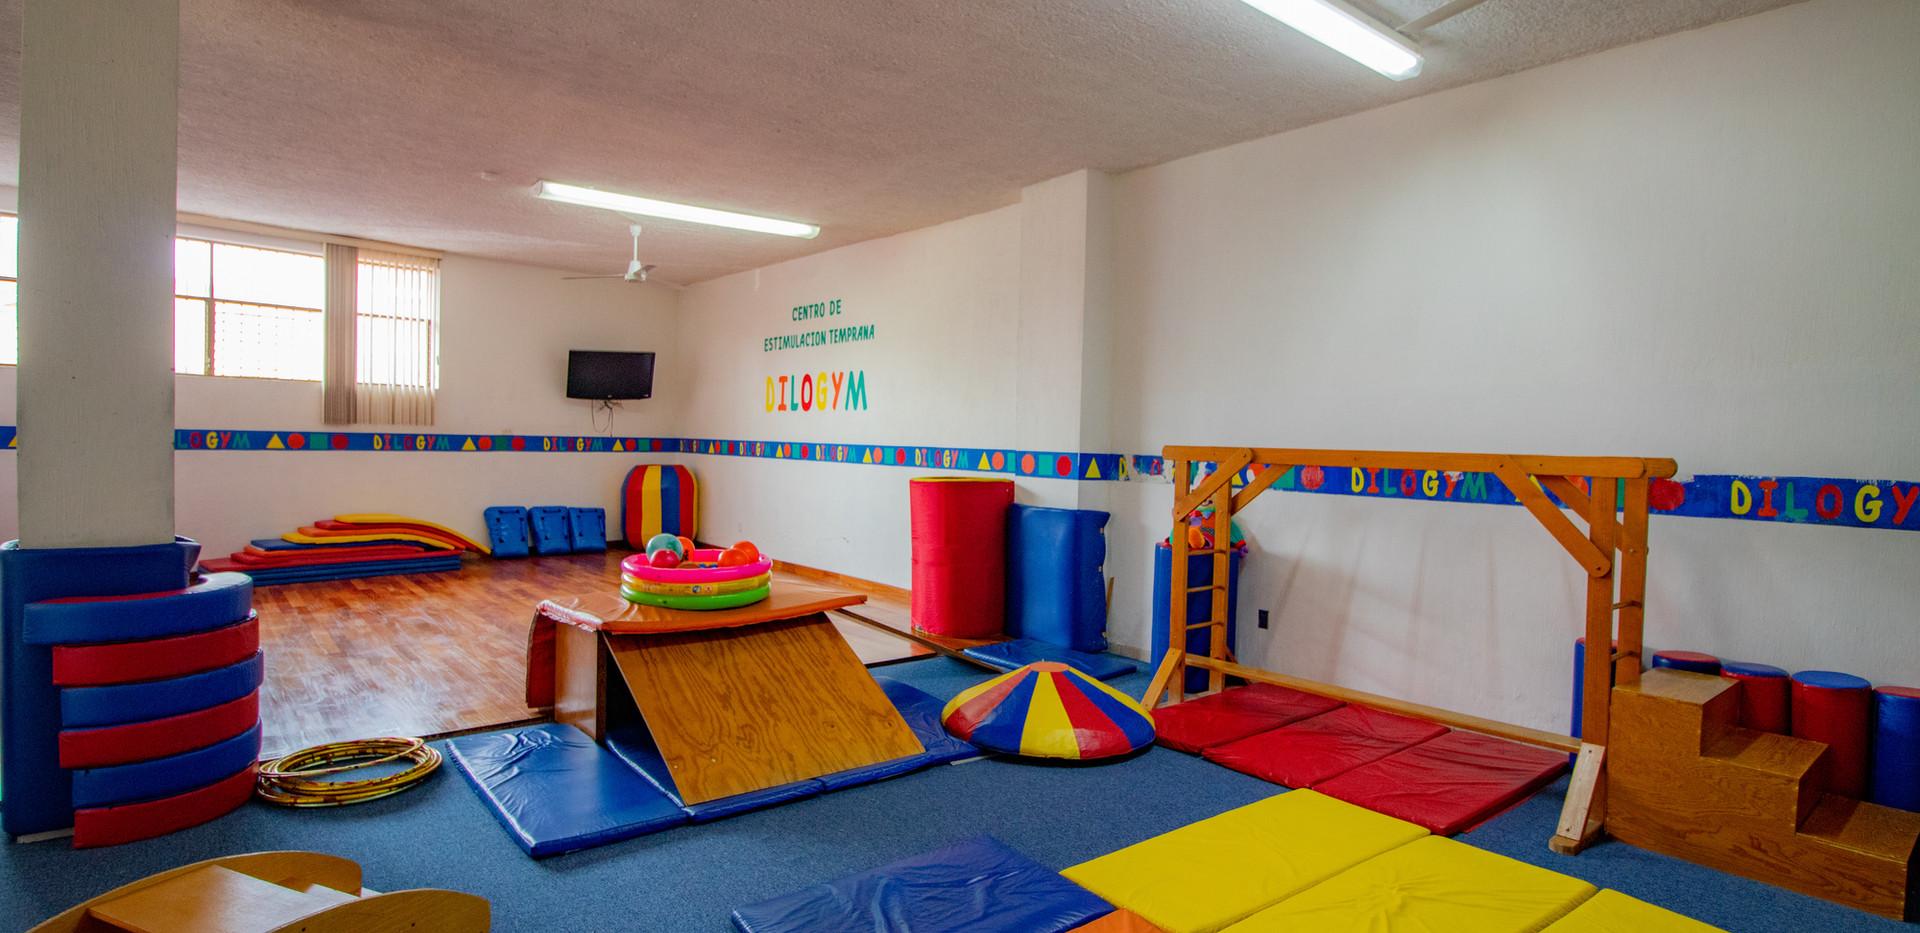 Colegio Bilingue - Gym Preescolar